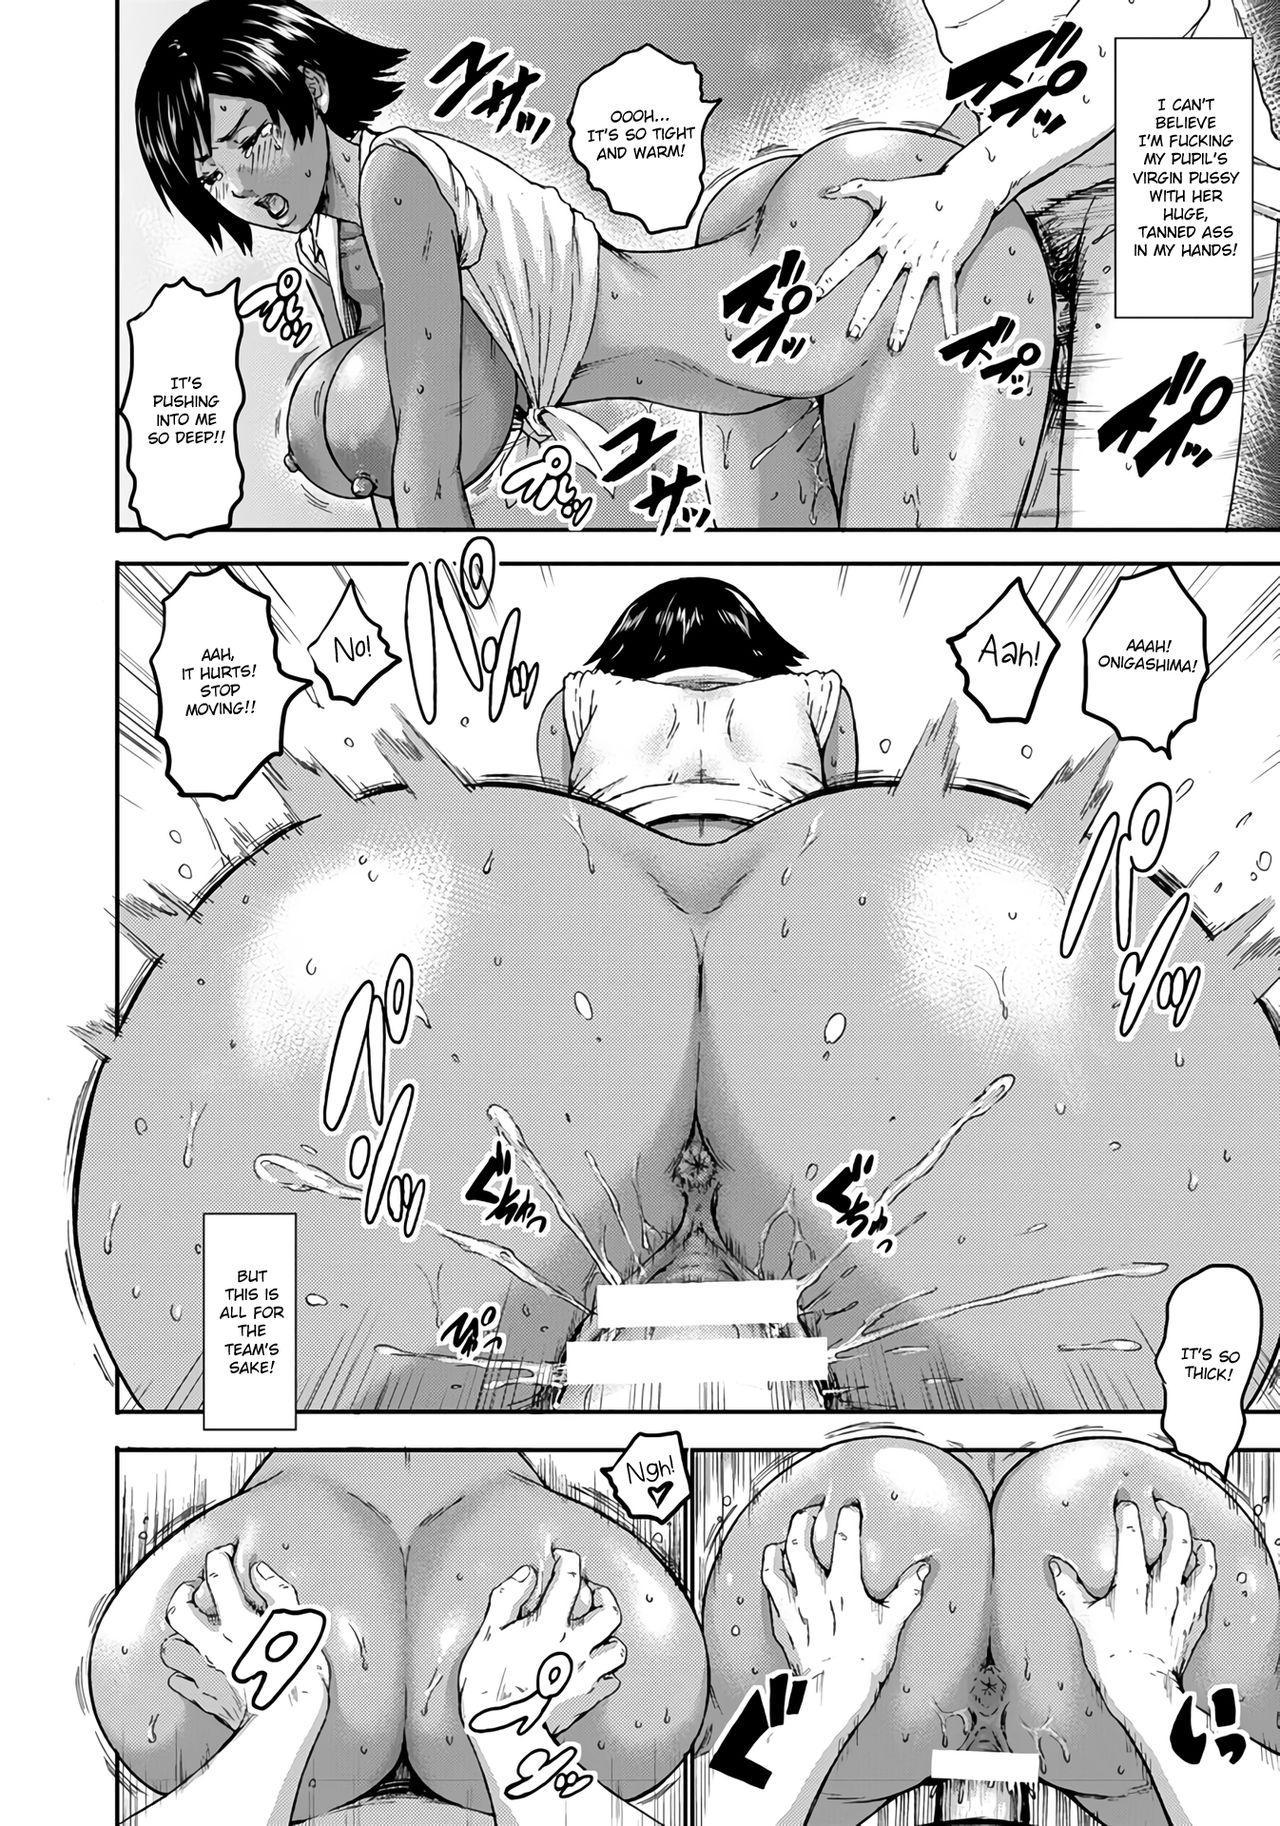 Chounyuu Gakuen | Academy For Huge Breasts Ch. 1-3 39